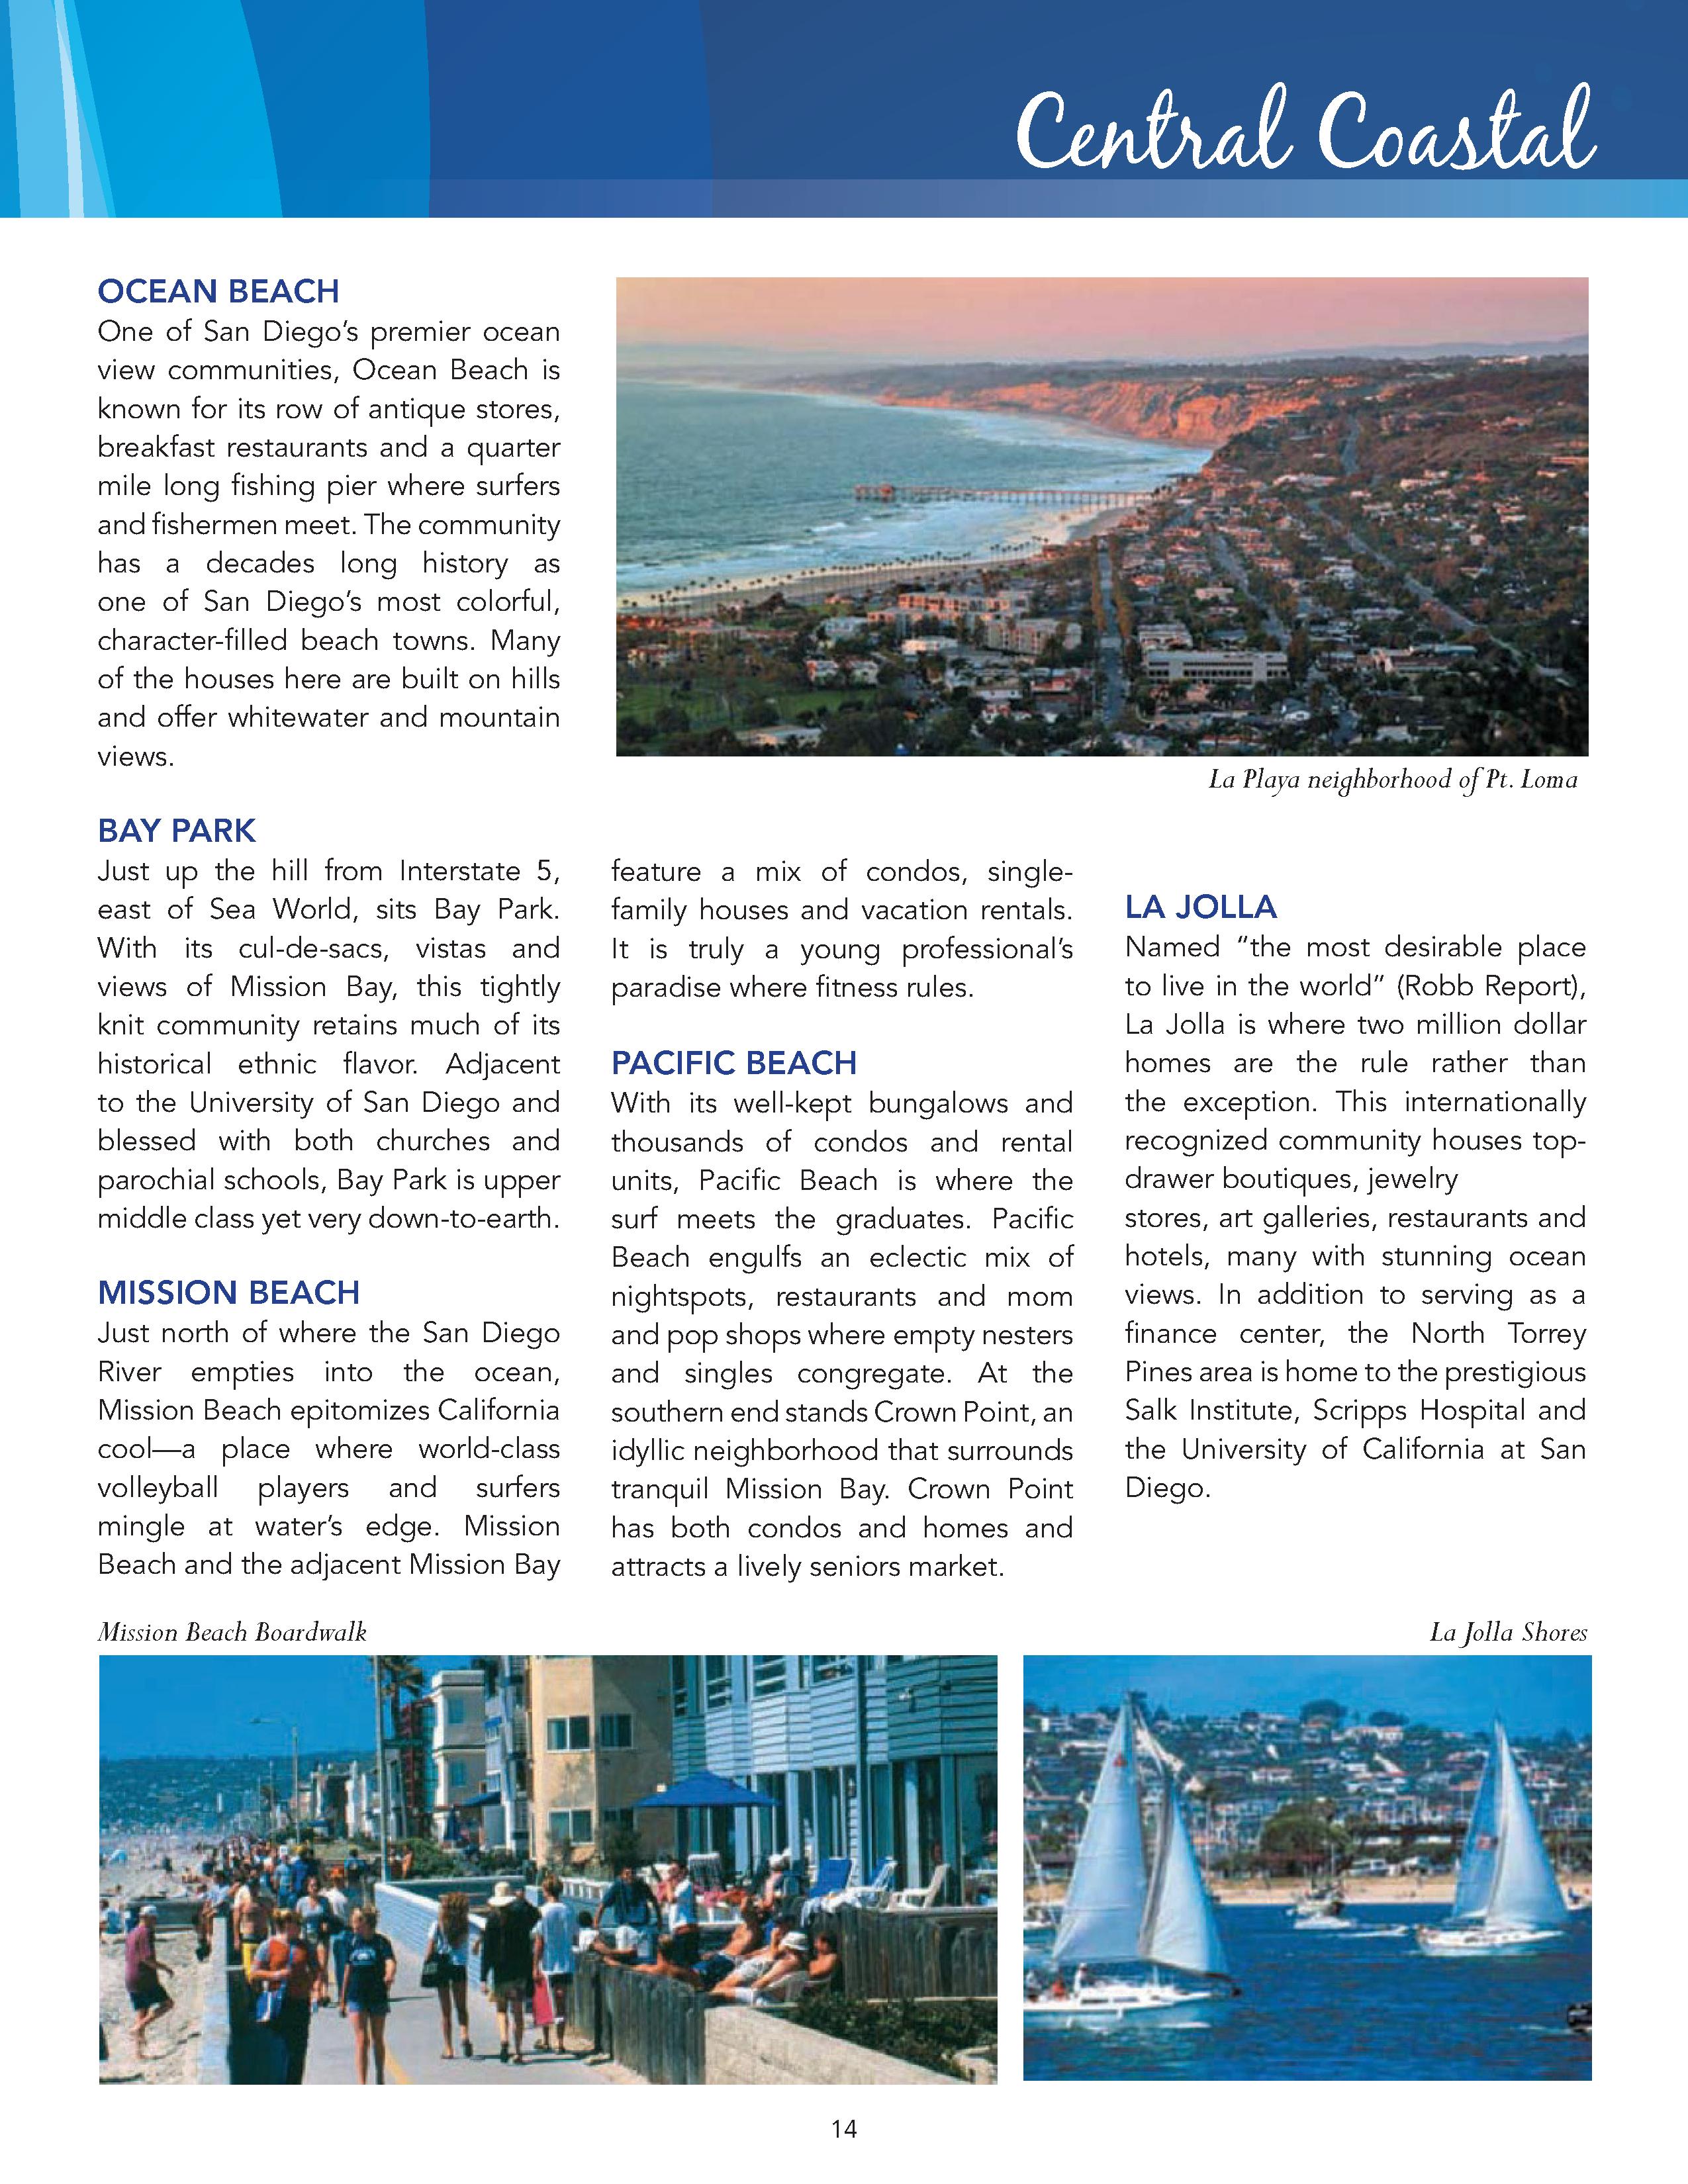 Central Coastal San Diego Page 2